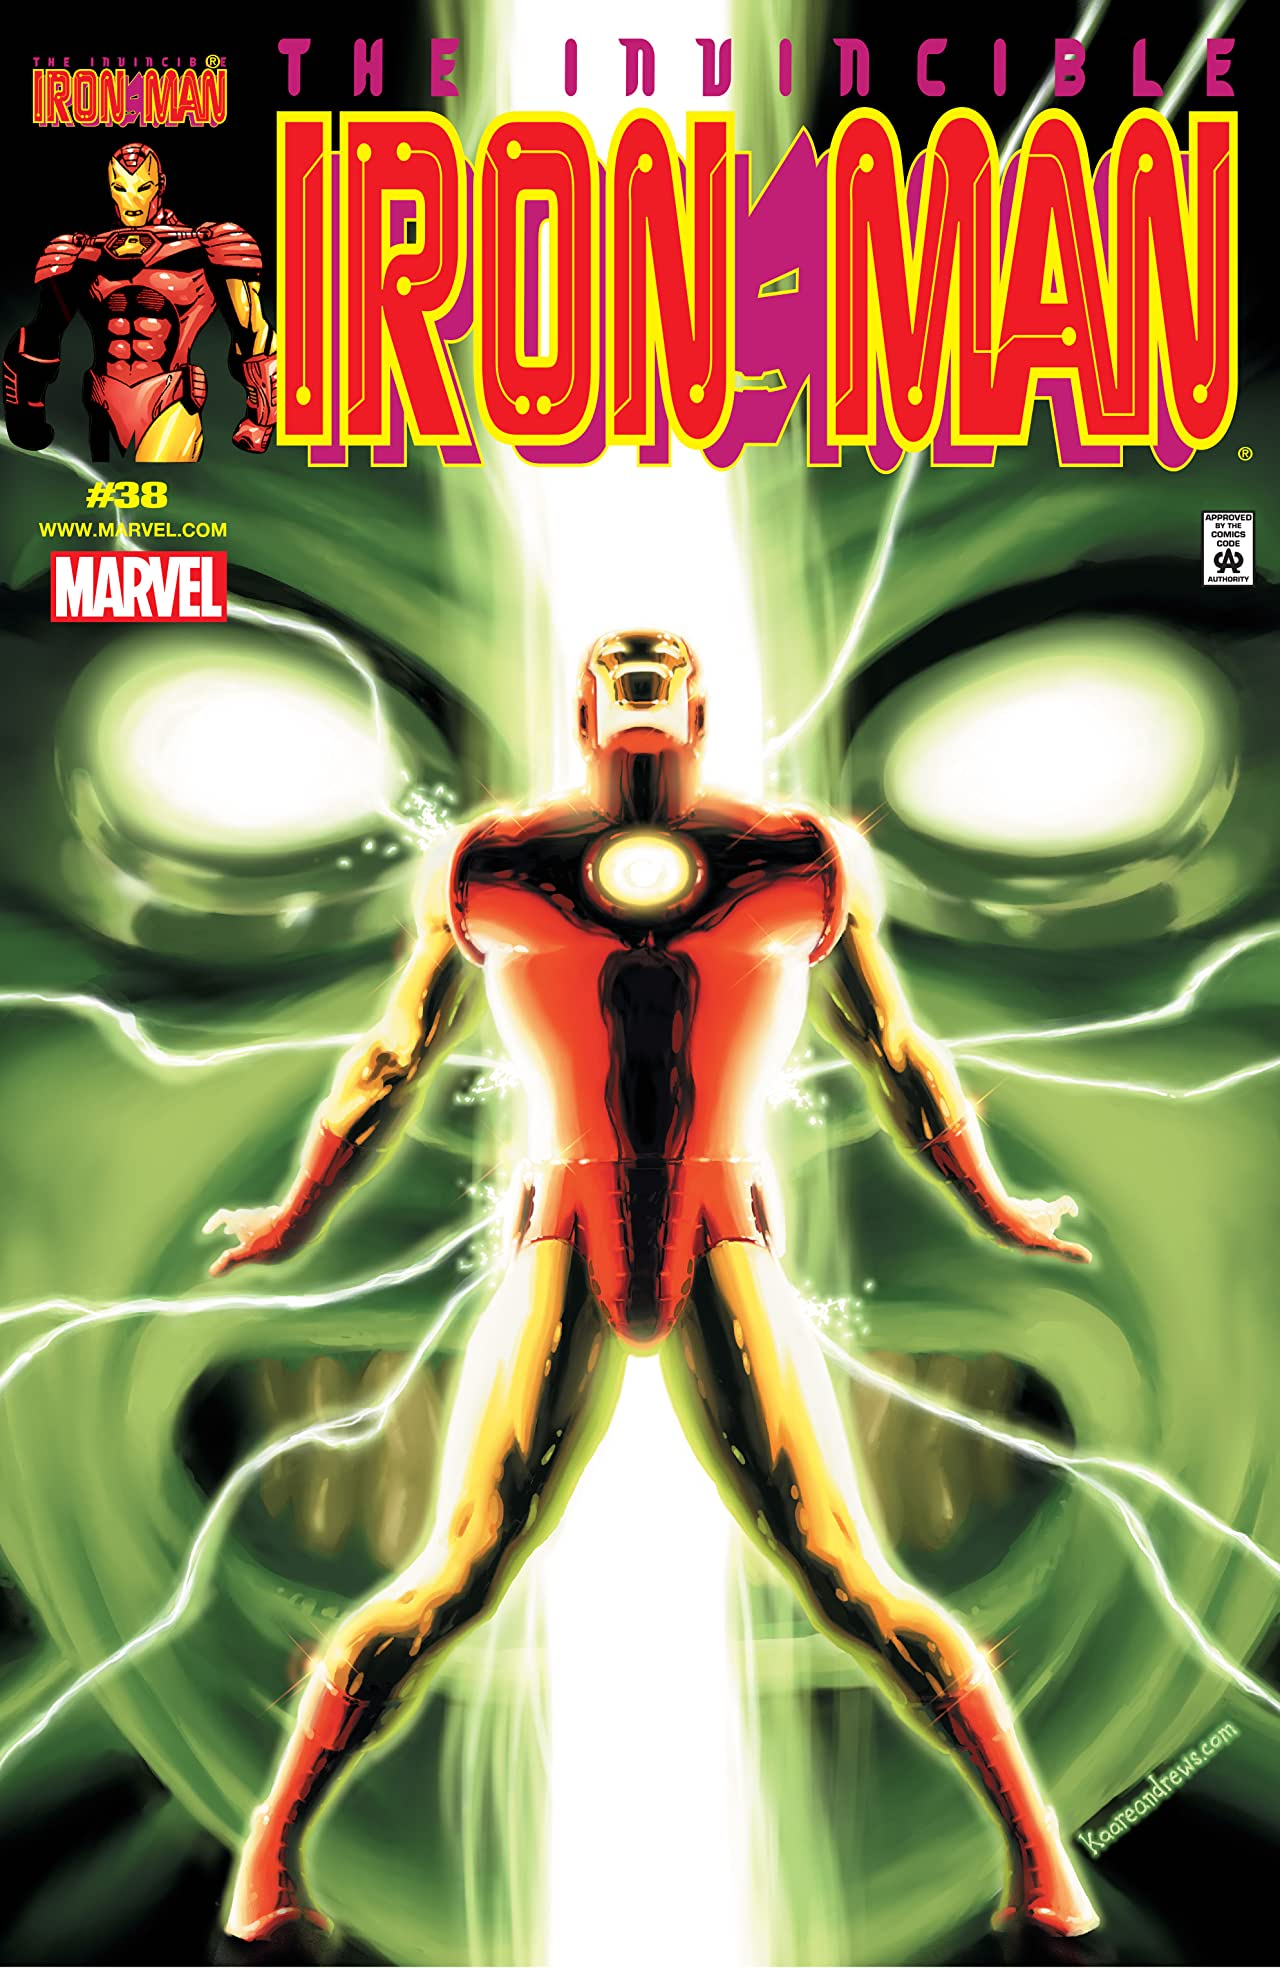 Iron Man (1998-2004) #38